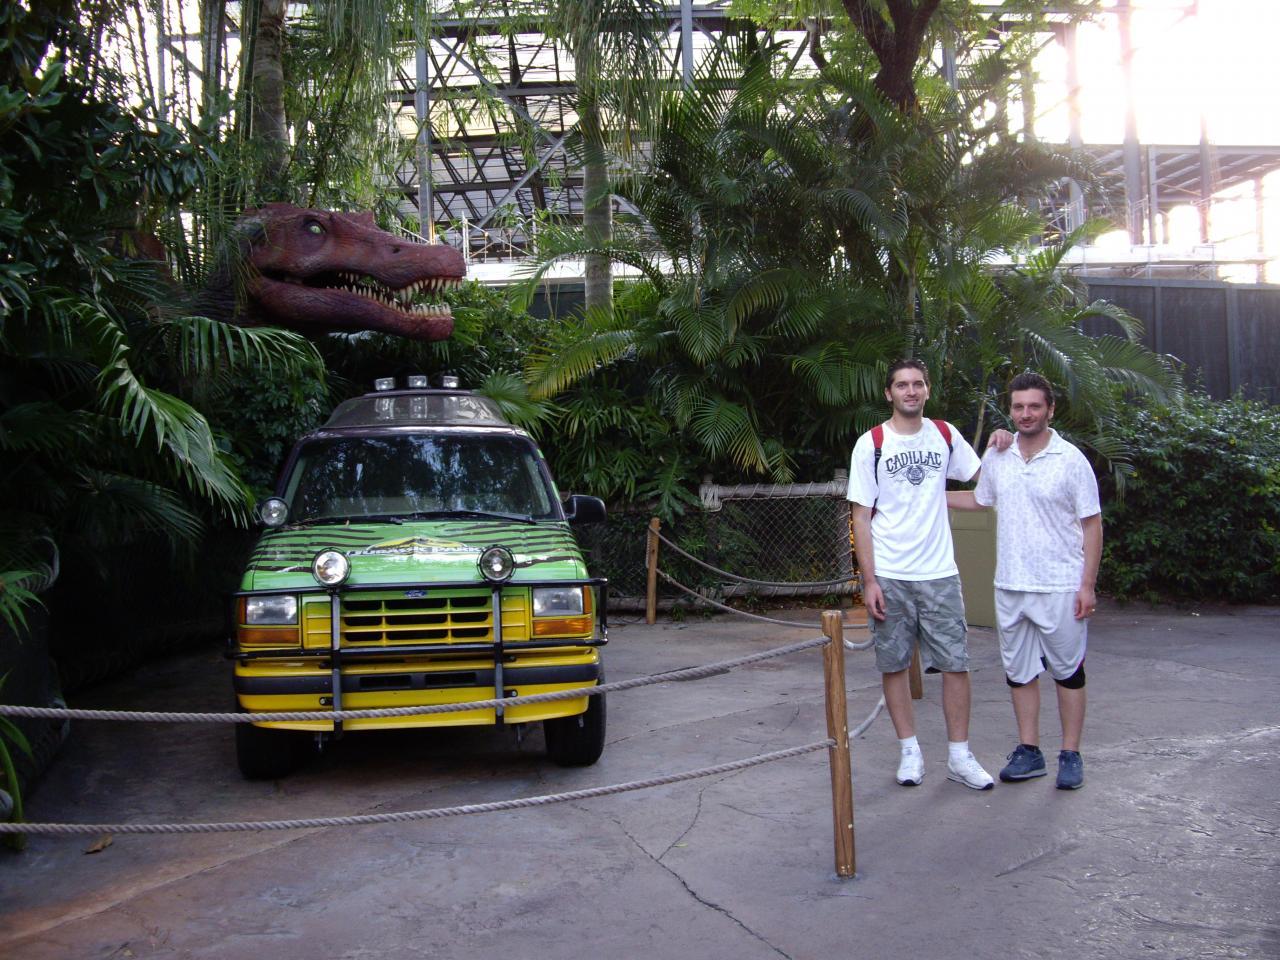 Jurassic Park, Islands of Adventure Orlando fl